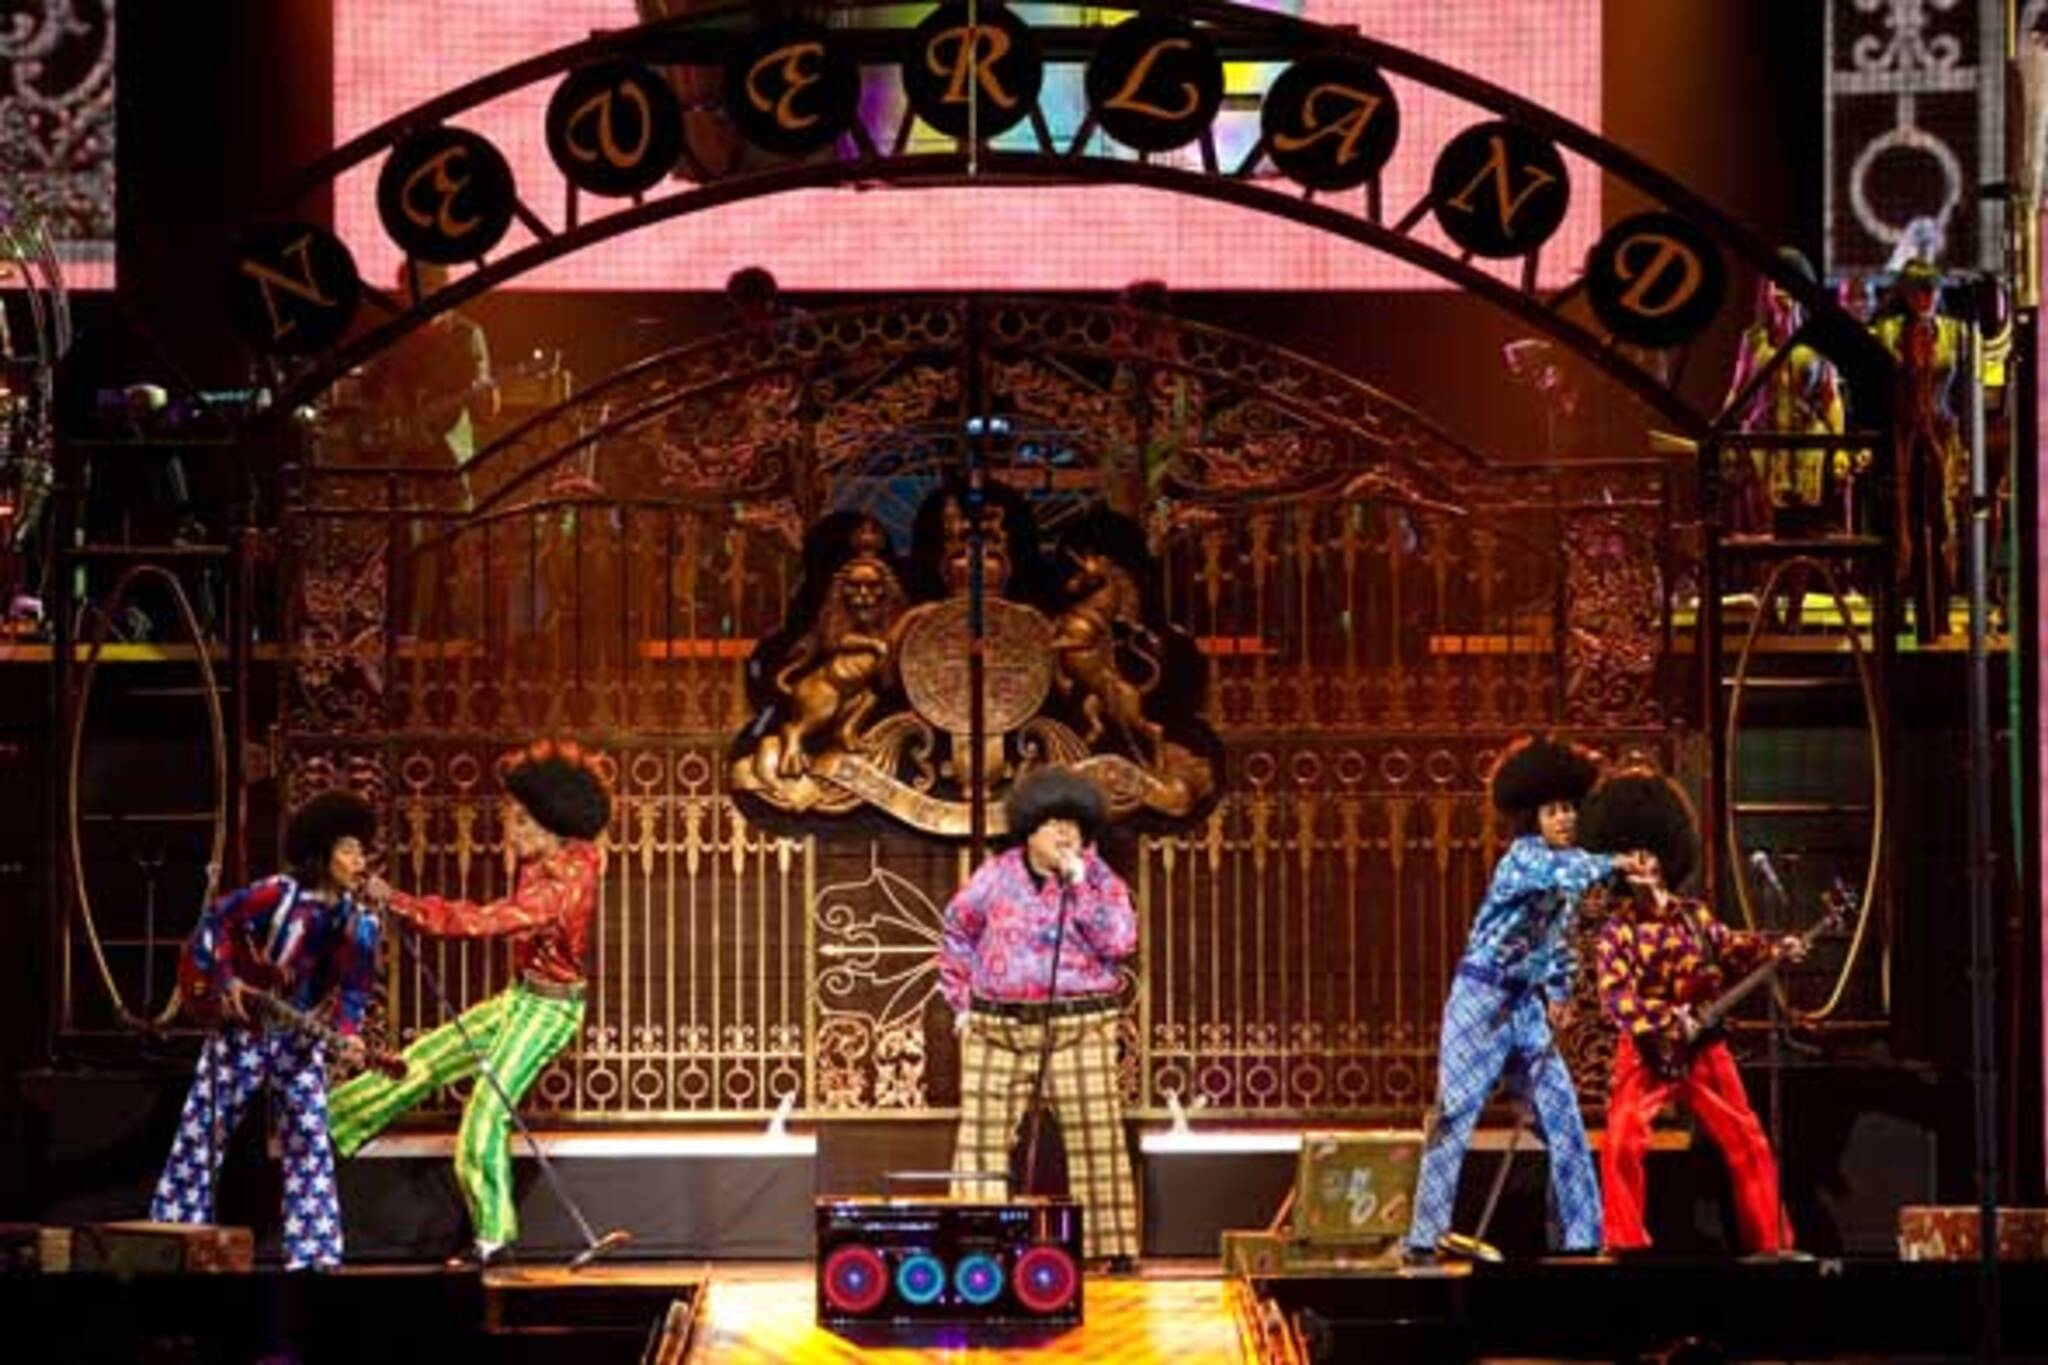 Michael Jackson The Immortal World Tour in Toronto